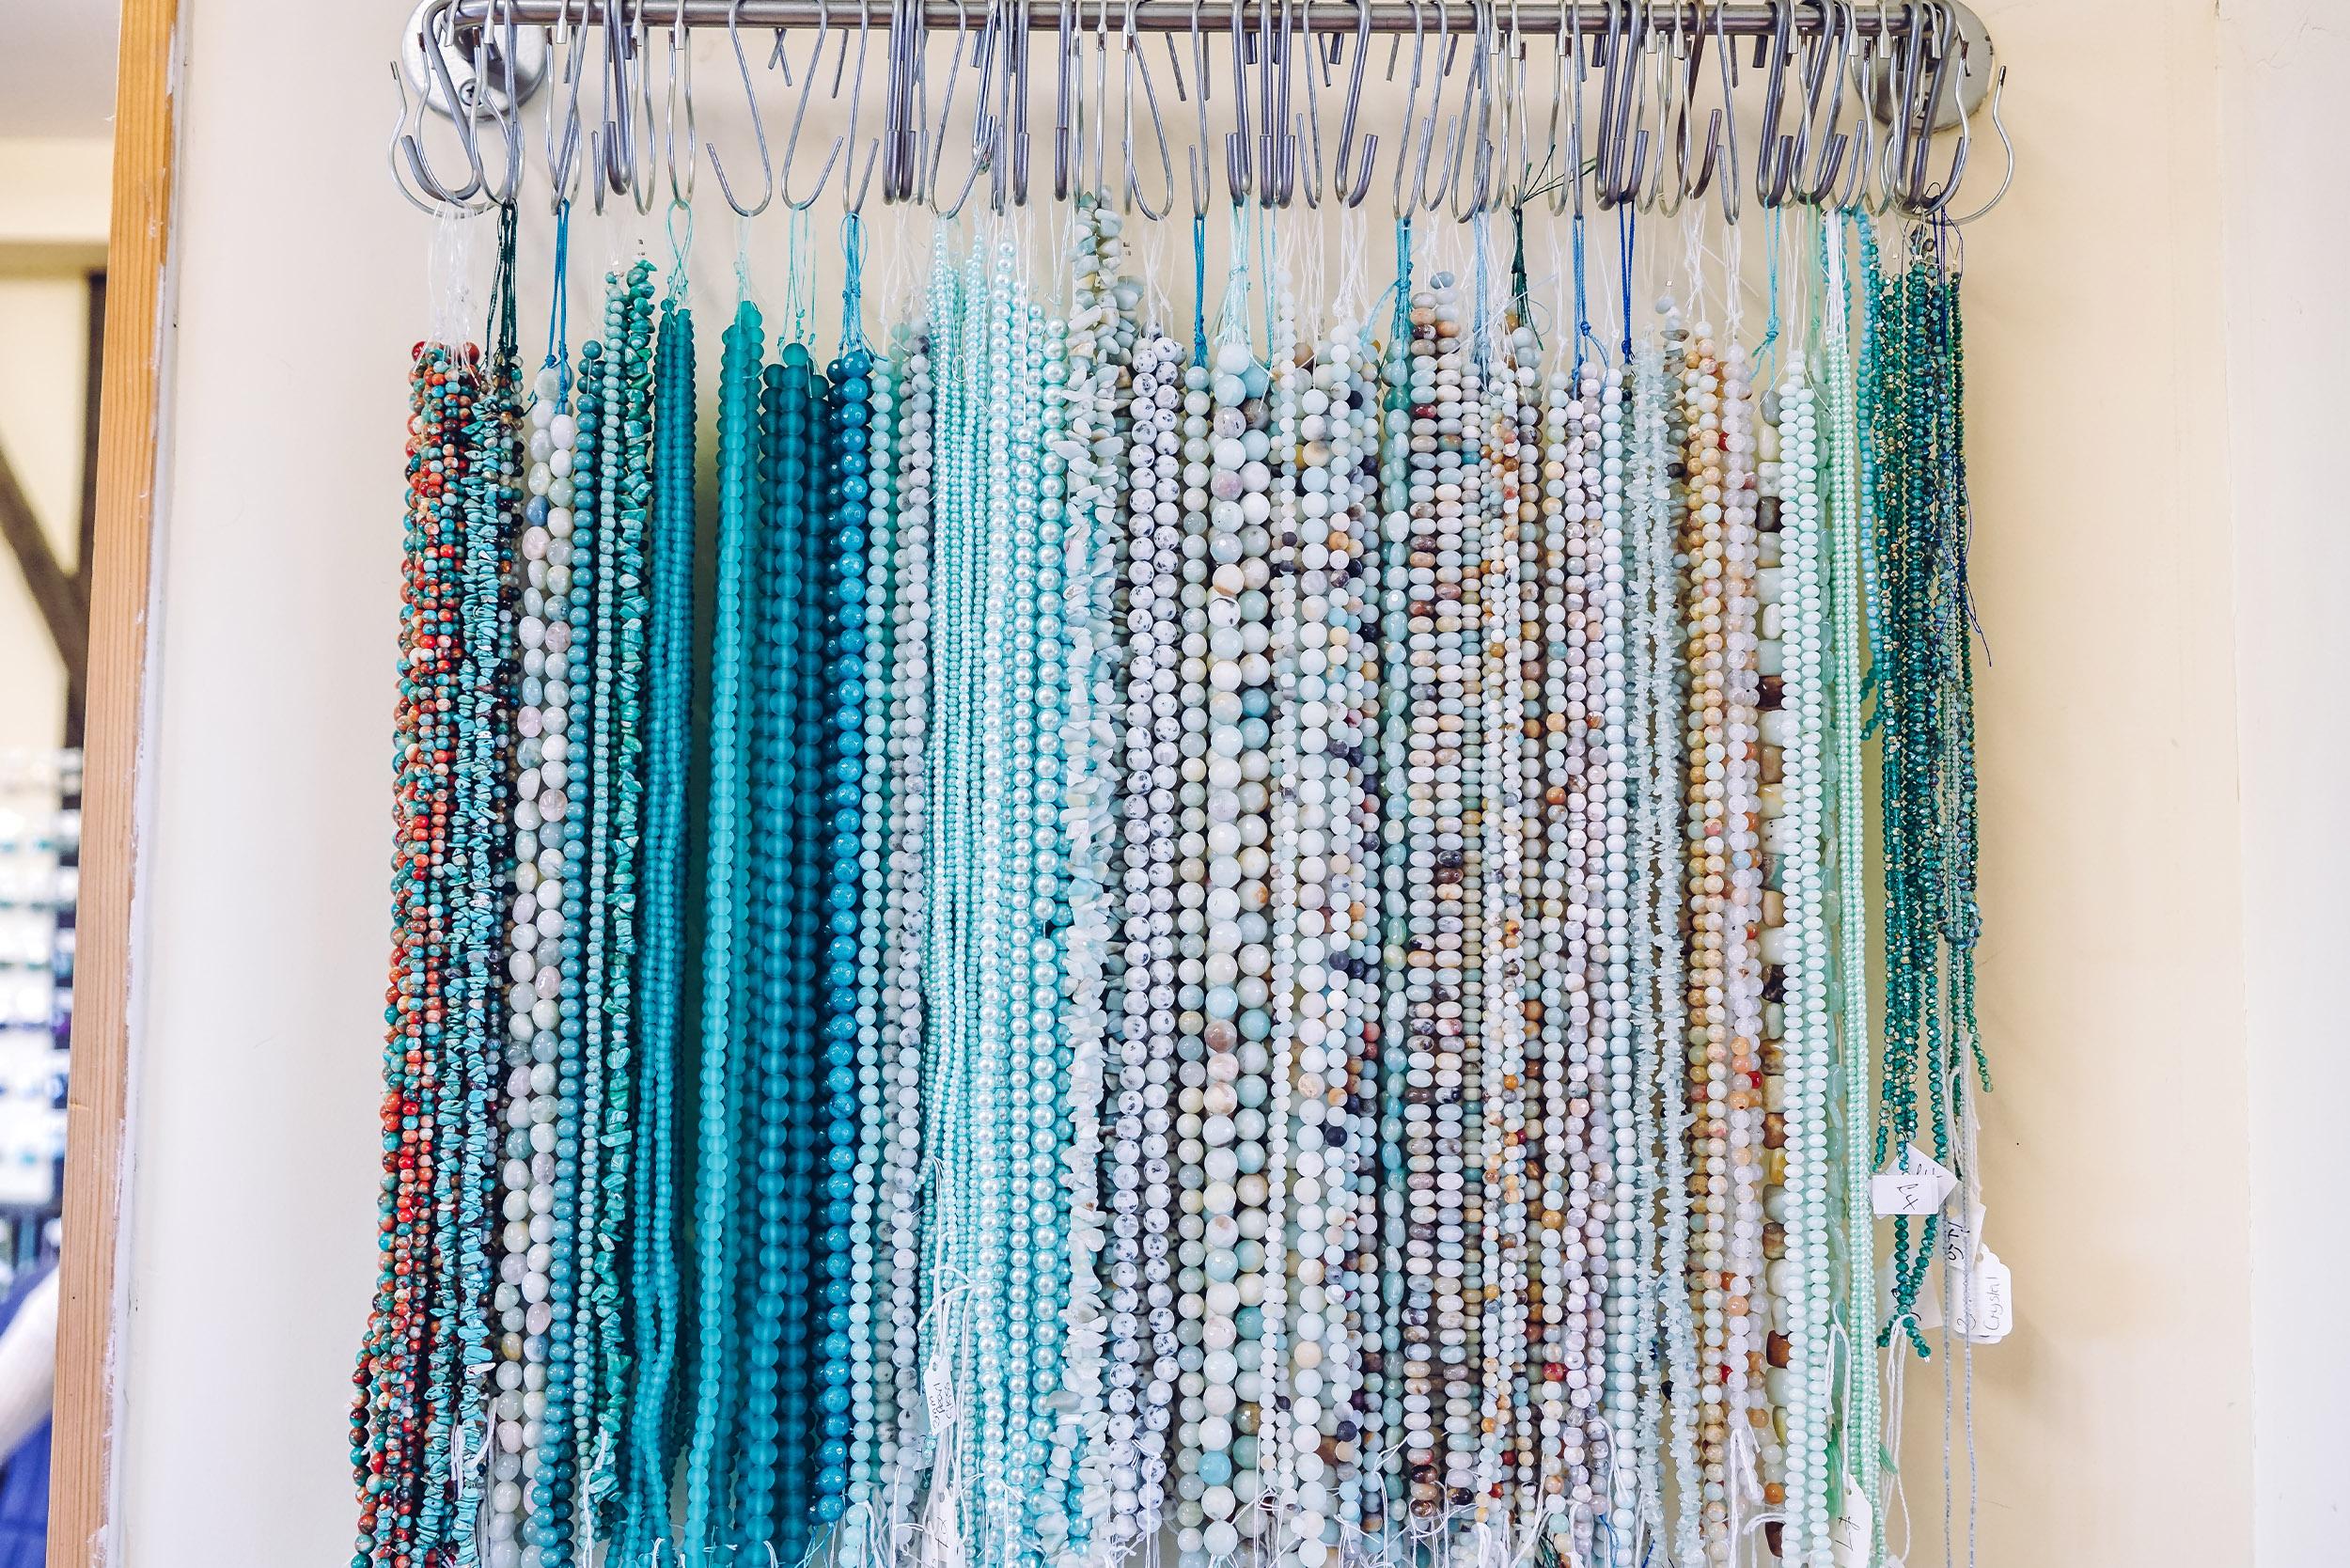 Deborah Beads - Colchester - Bead Shop 5.jpg